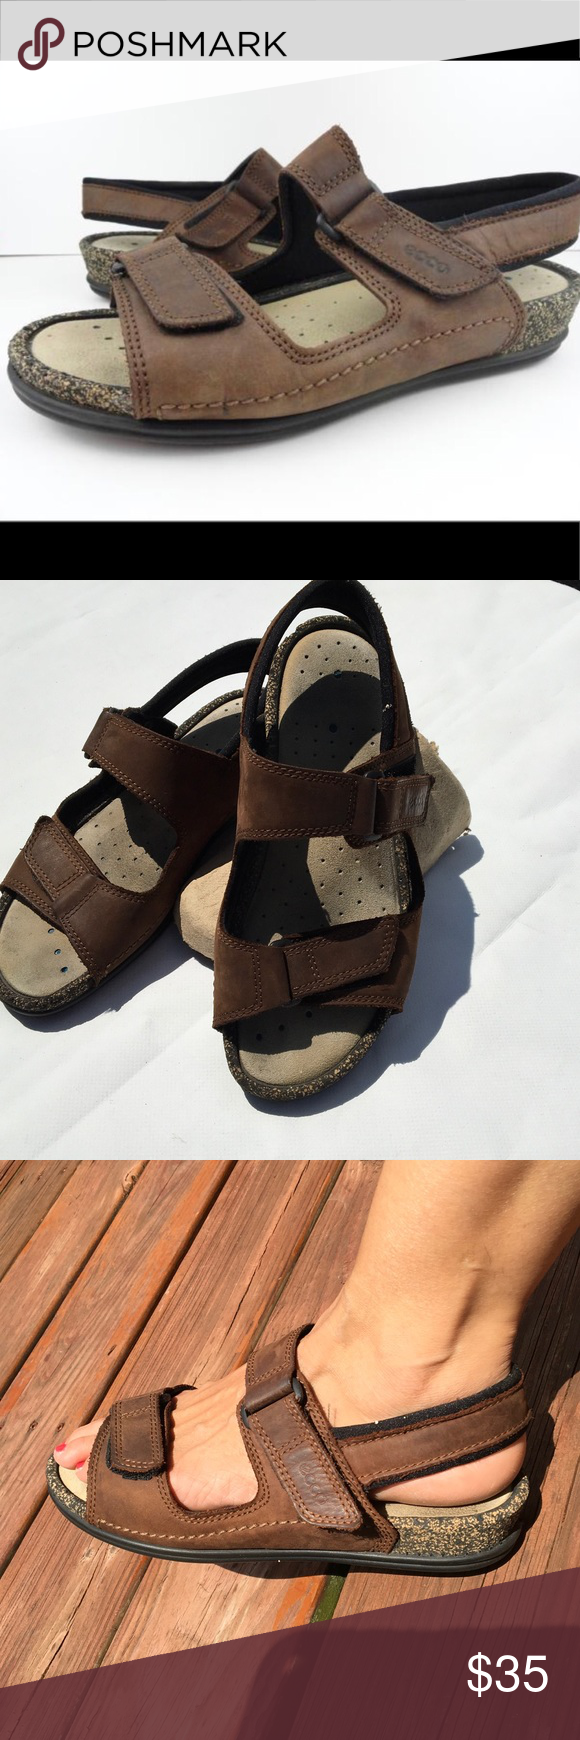 57f8c6ad44b4 Ecco leather cork sandal sz39 Ecco cork heel Sandal oil leather ...